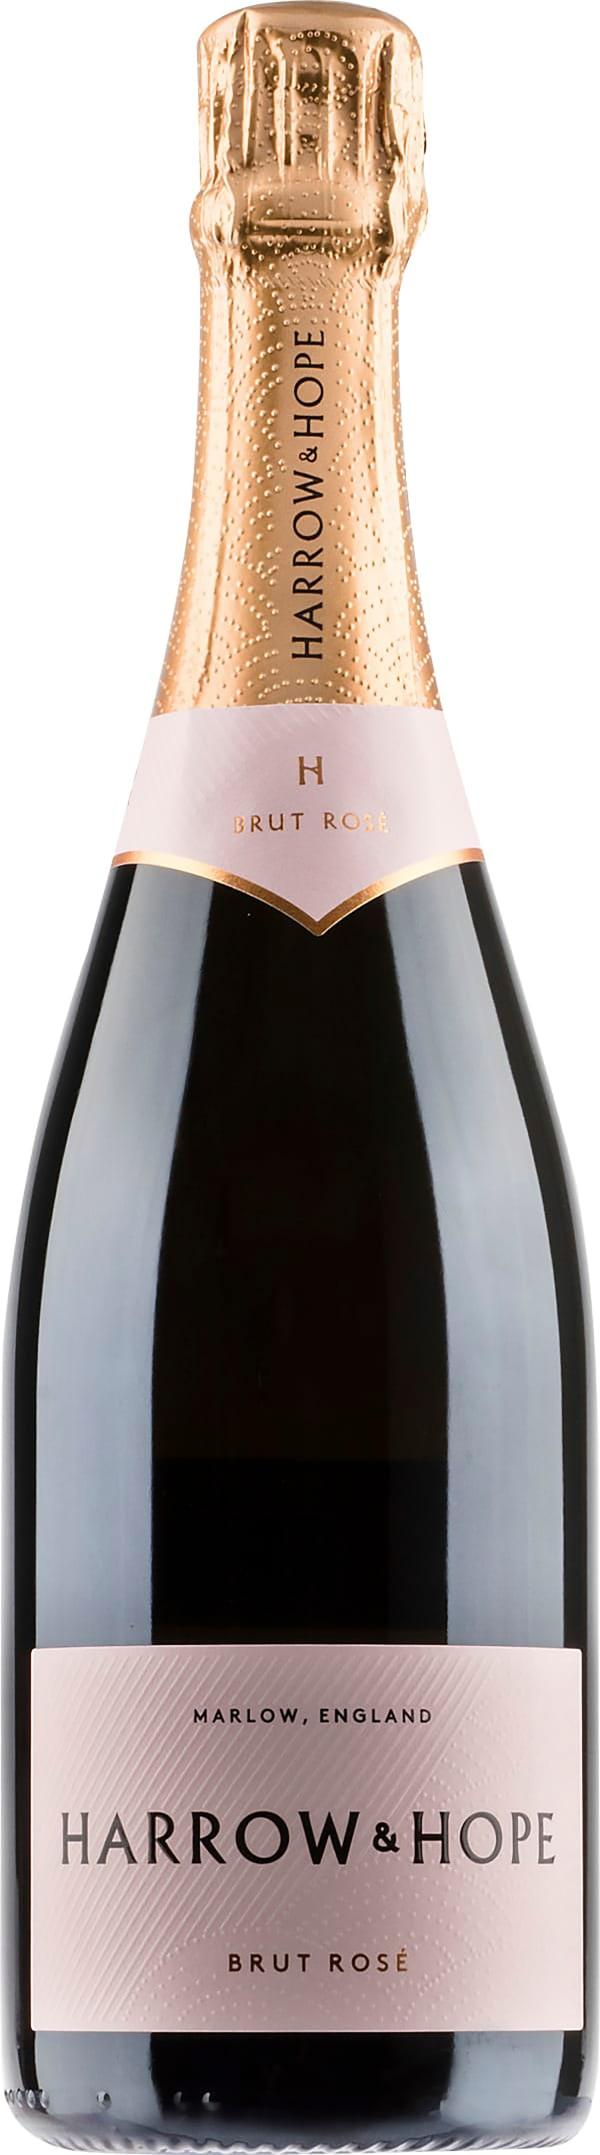 Harrow & Hope Rosé Brut 2015